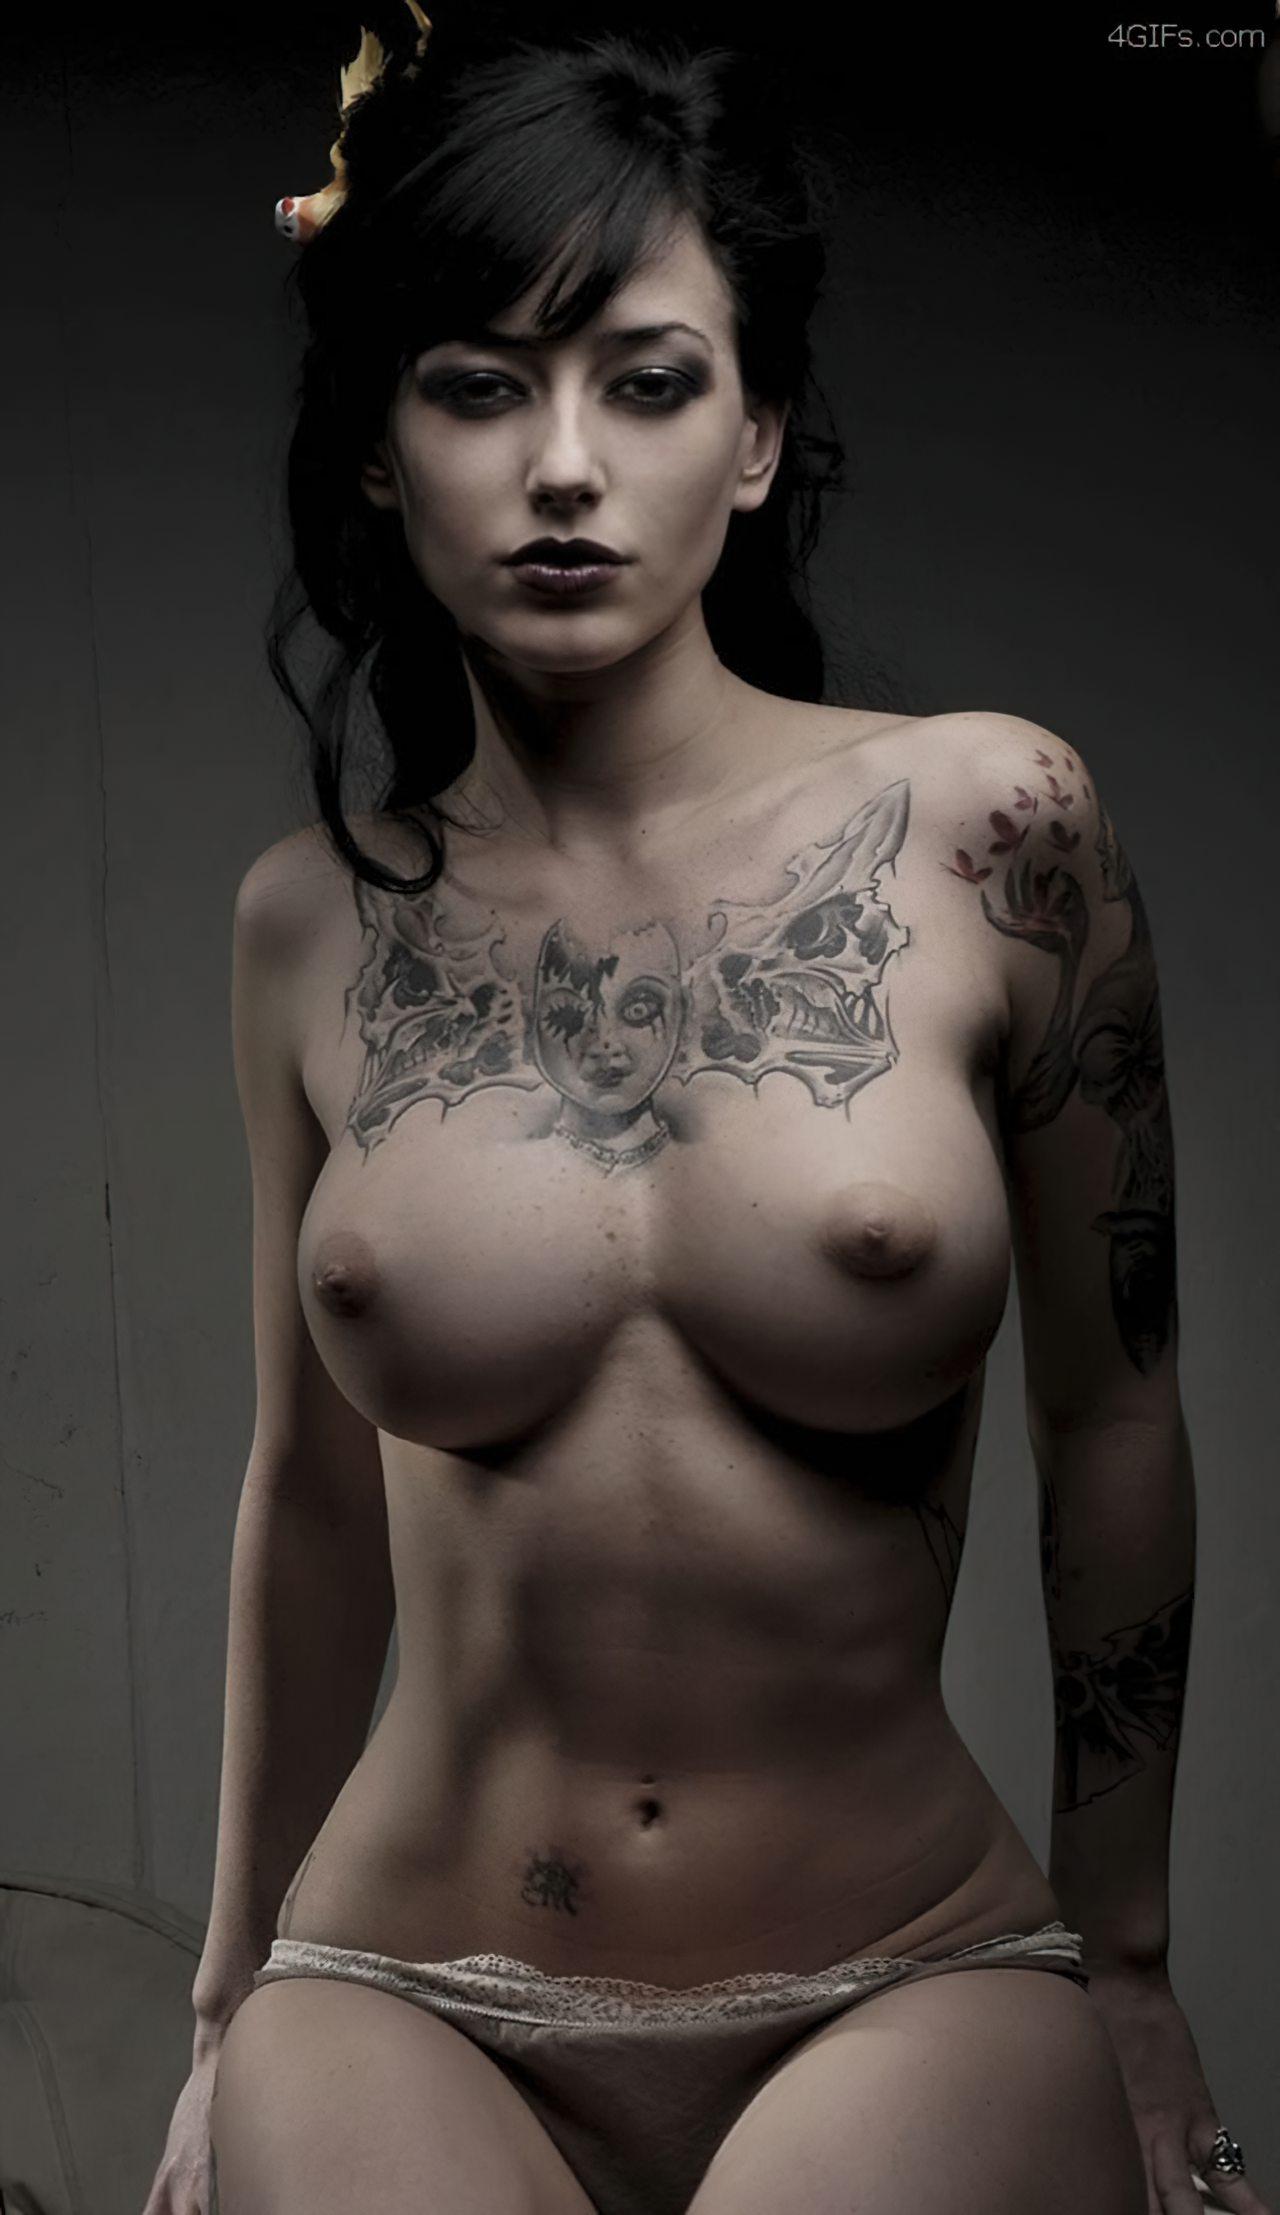 Mulheres Safadas (32)